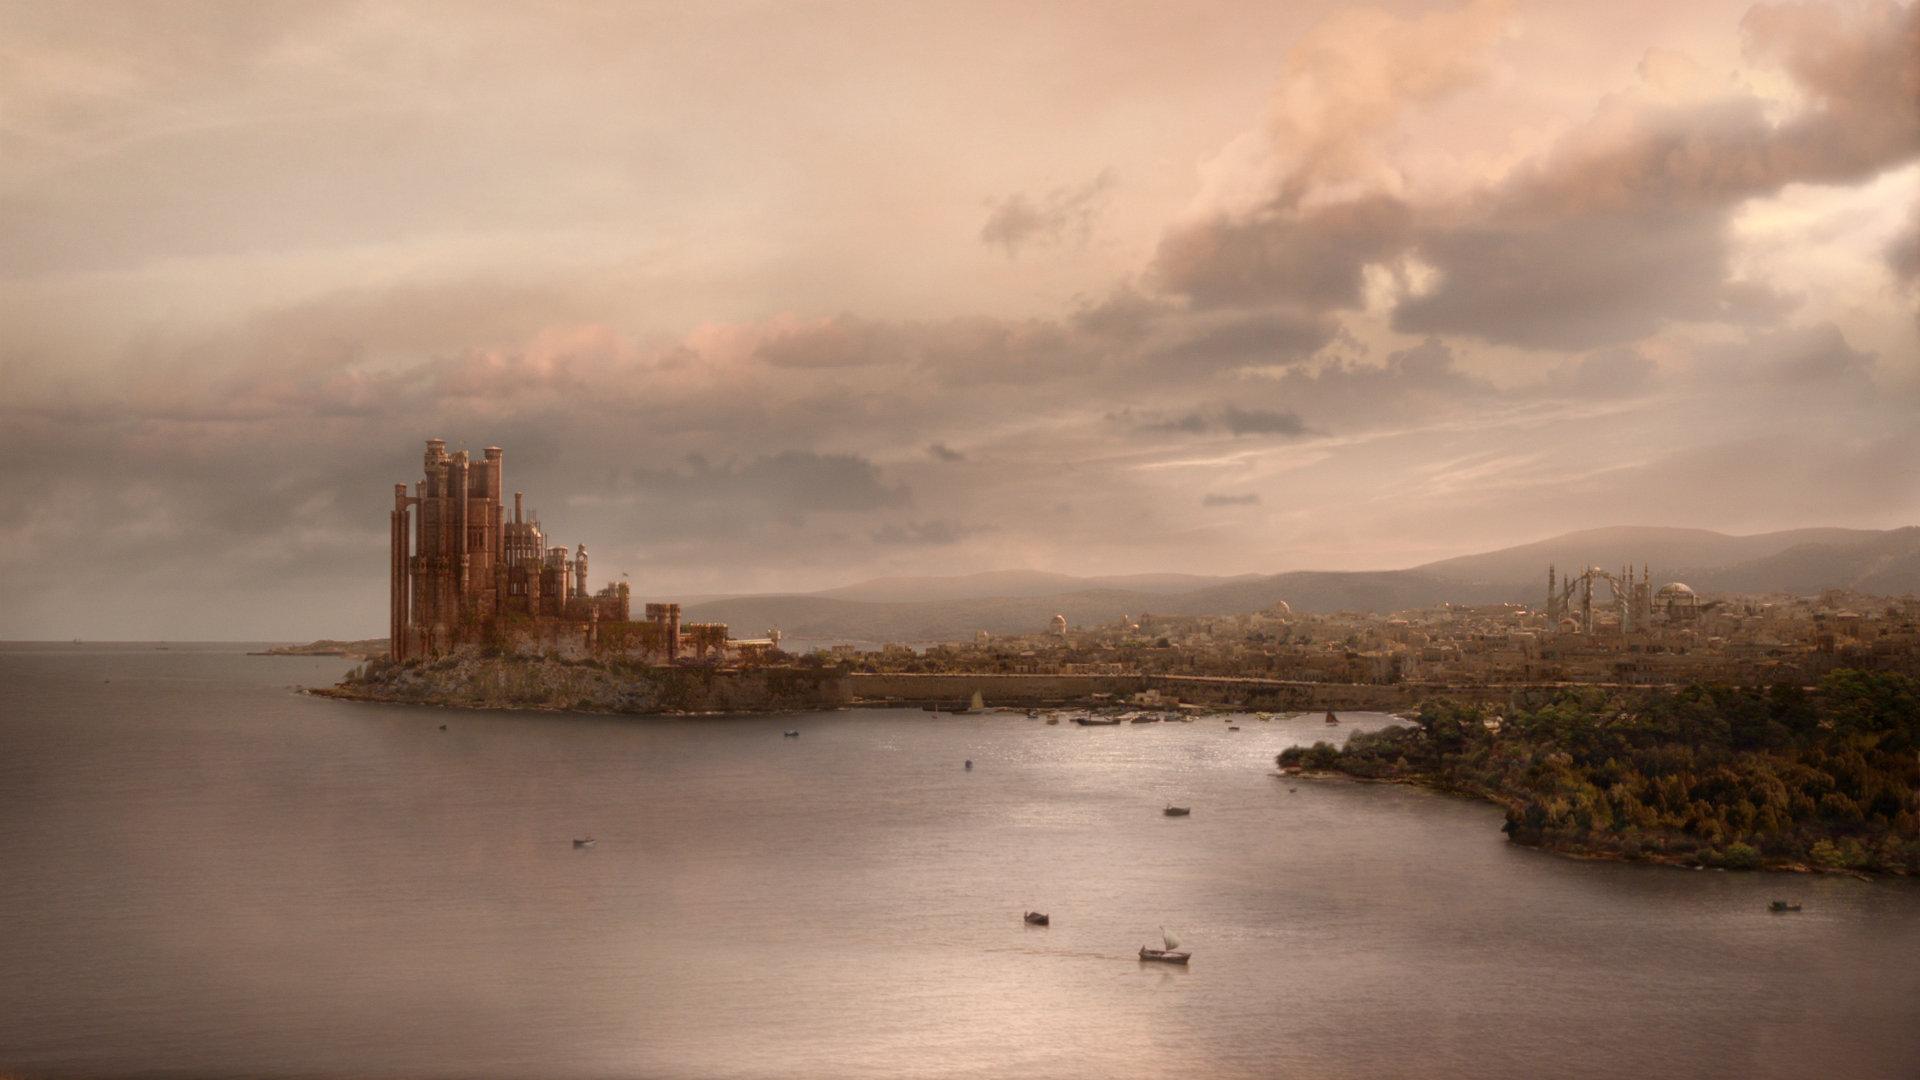 Game Of Thrones wallpapers 1920x1080 Full HD 1080p desktop 1920x1080